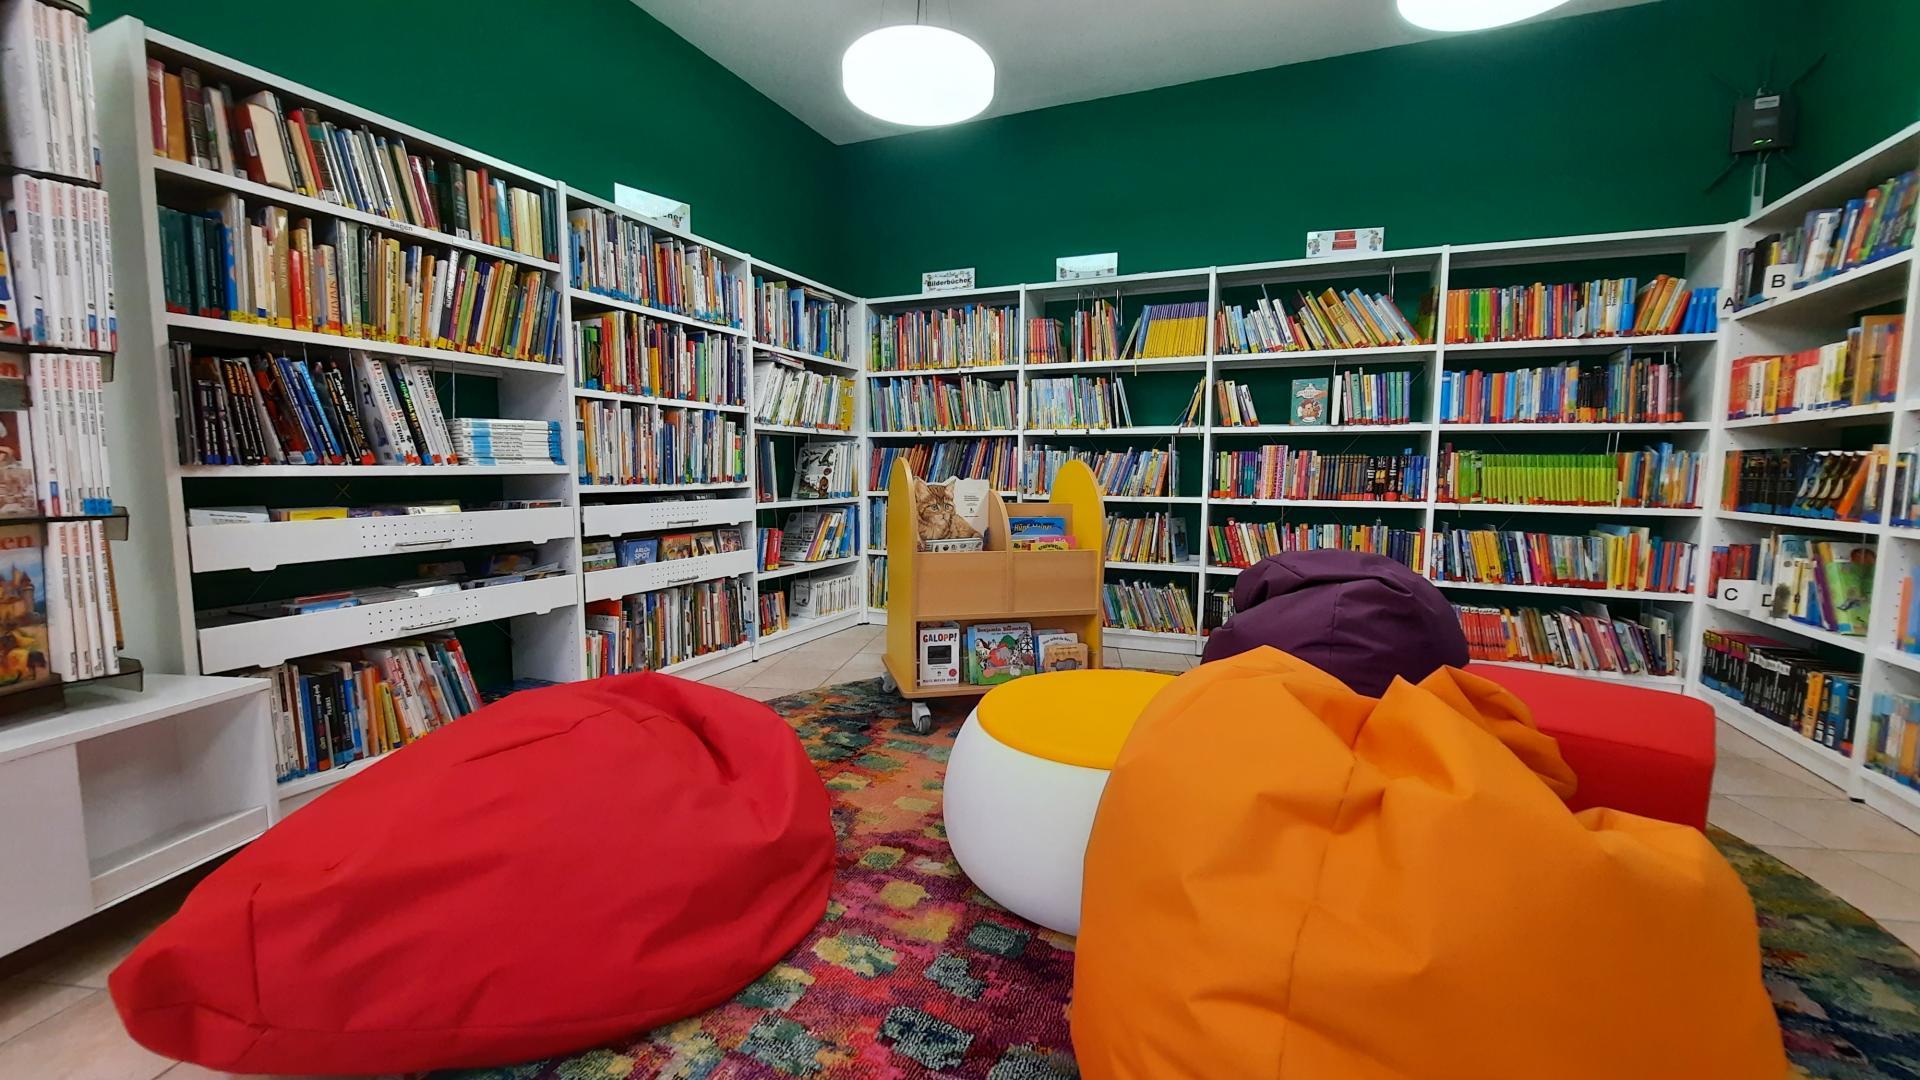 Bibliothek Grünheide, Foto: Gemeinde Grünheide (Mark)